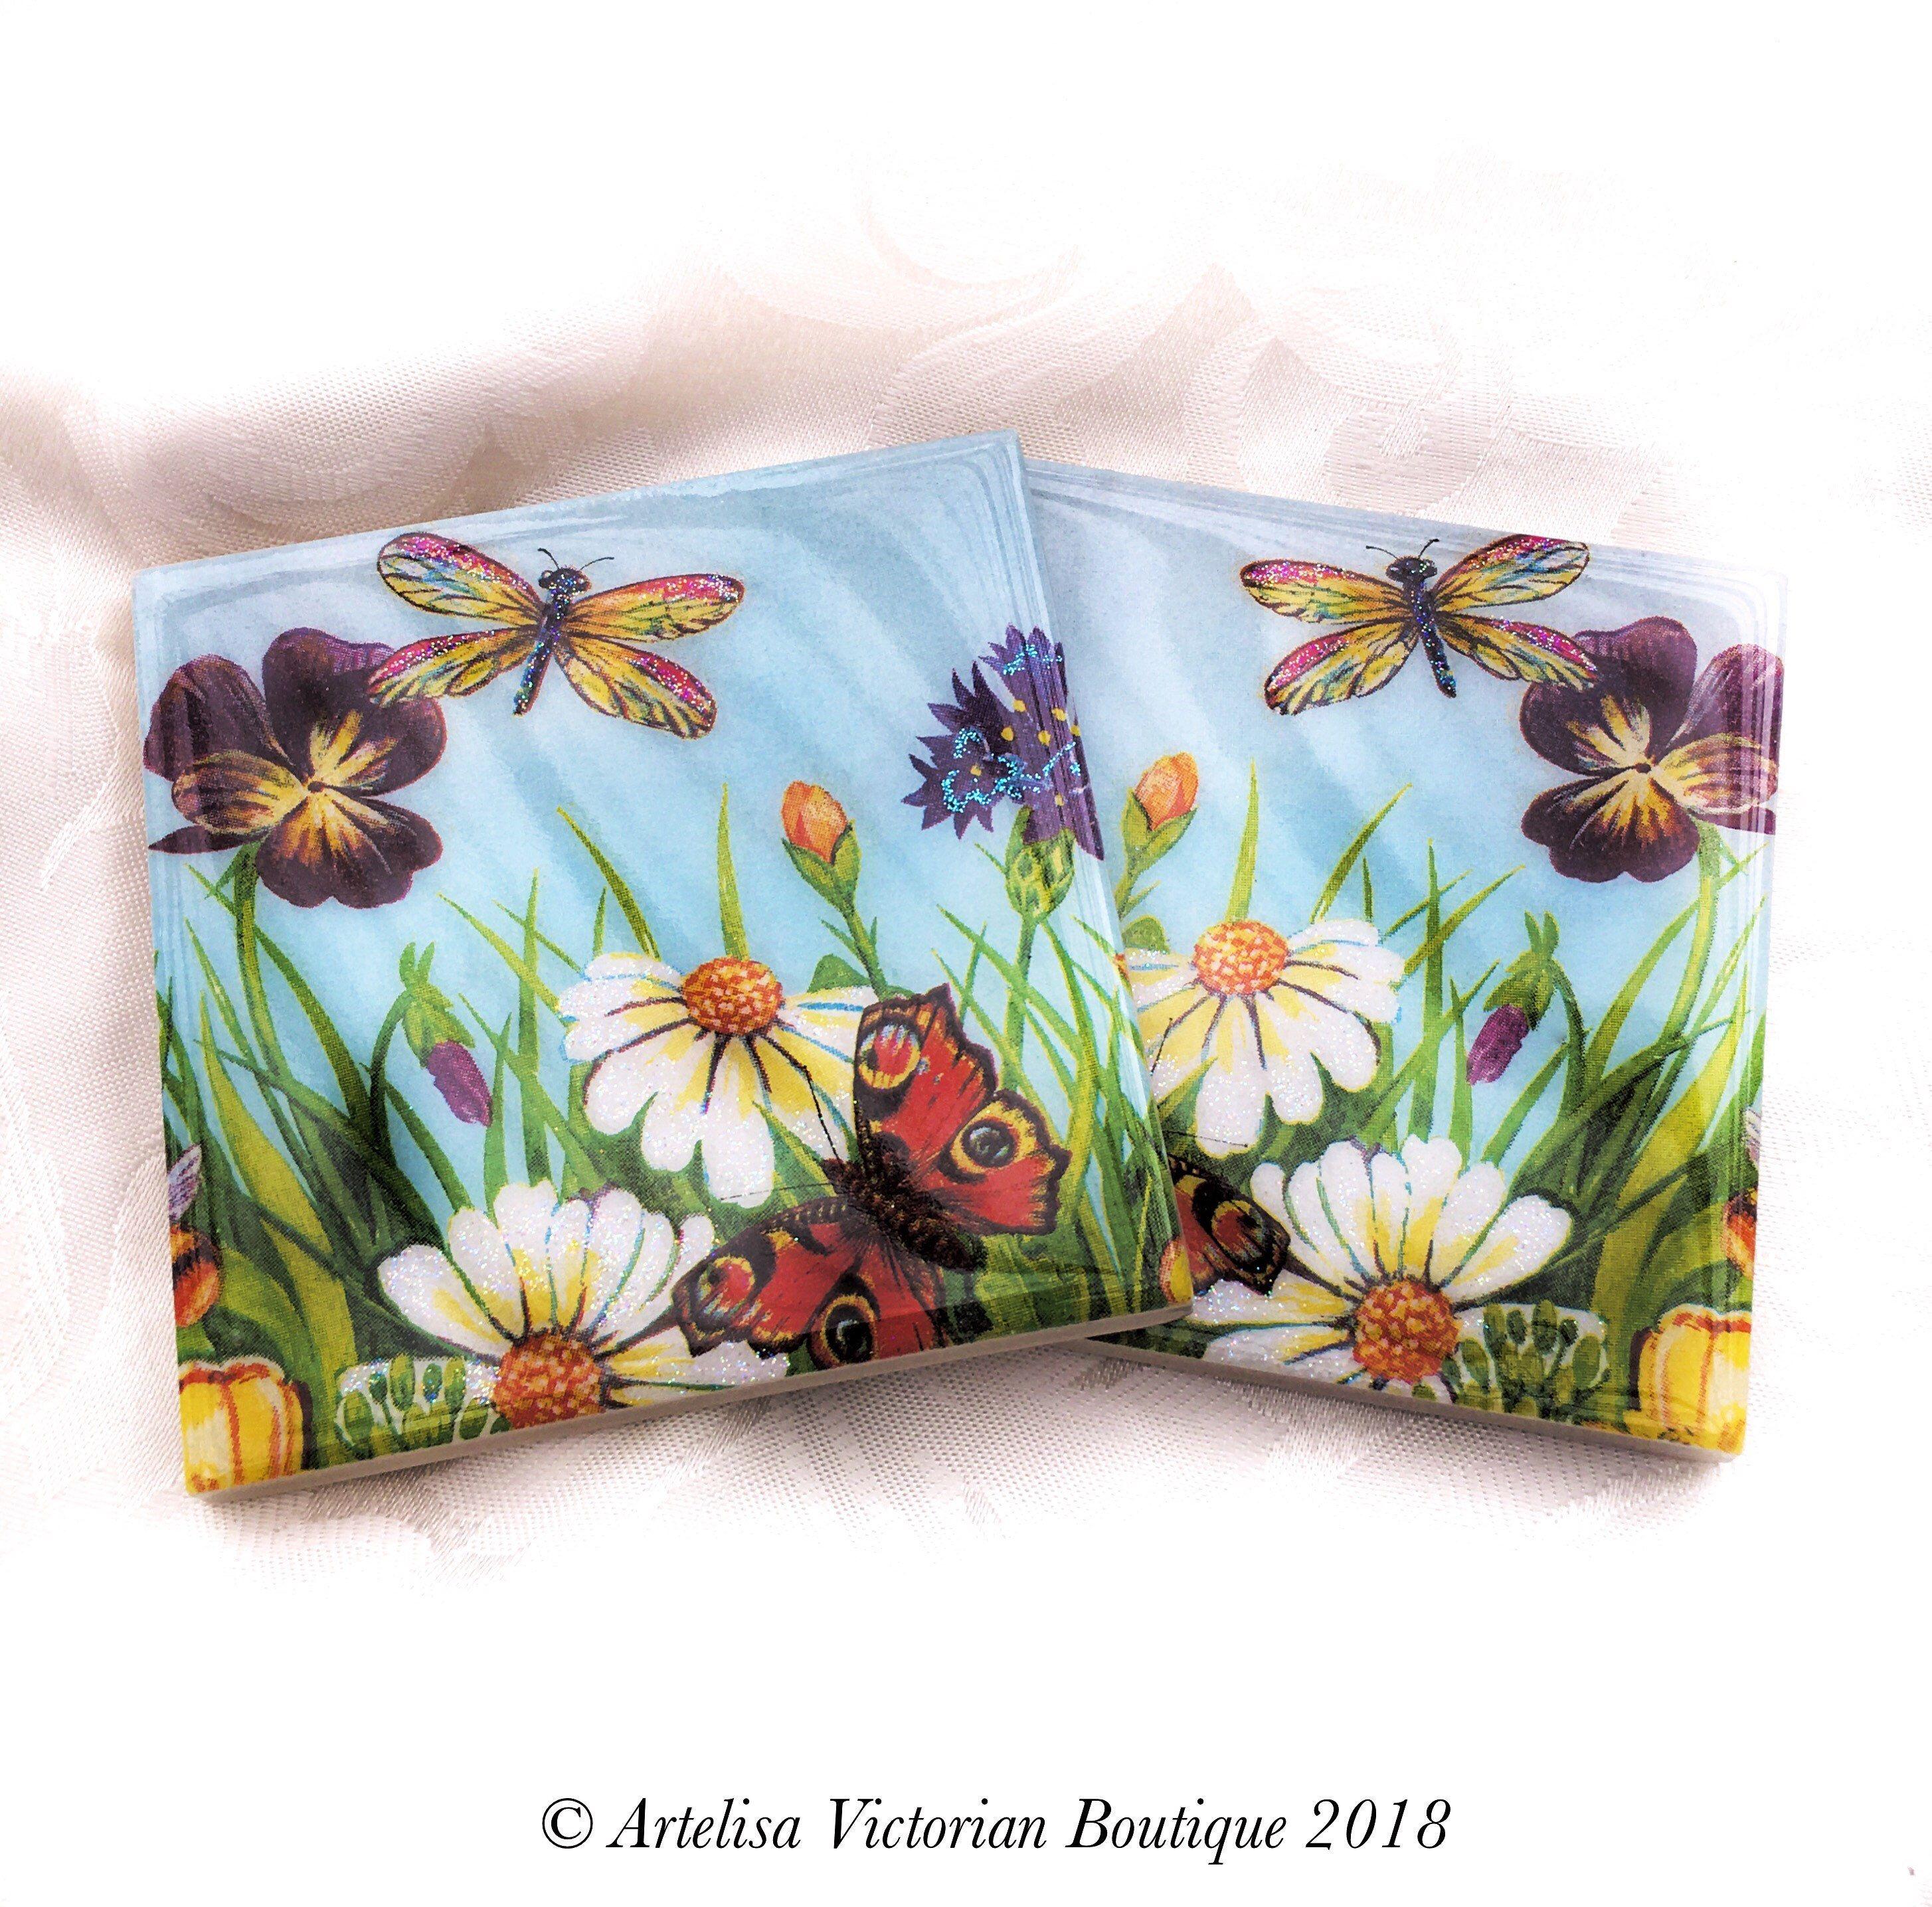 Floral Garden Ceramic Coasters Table Saver Mats Tea